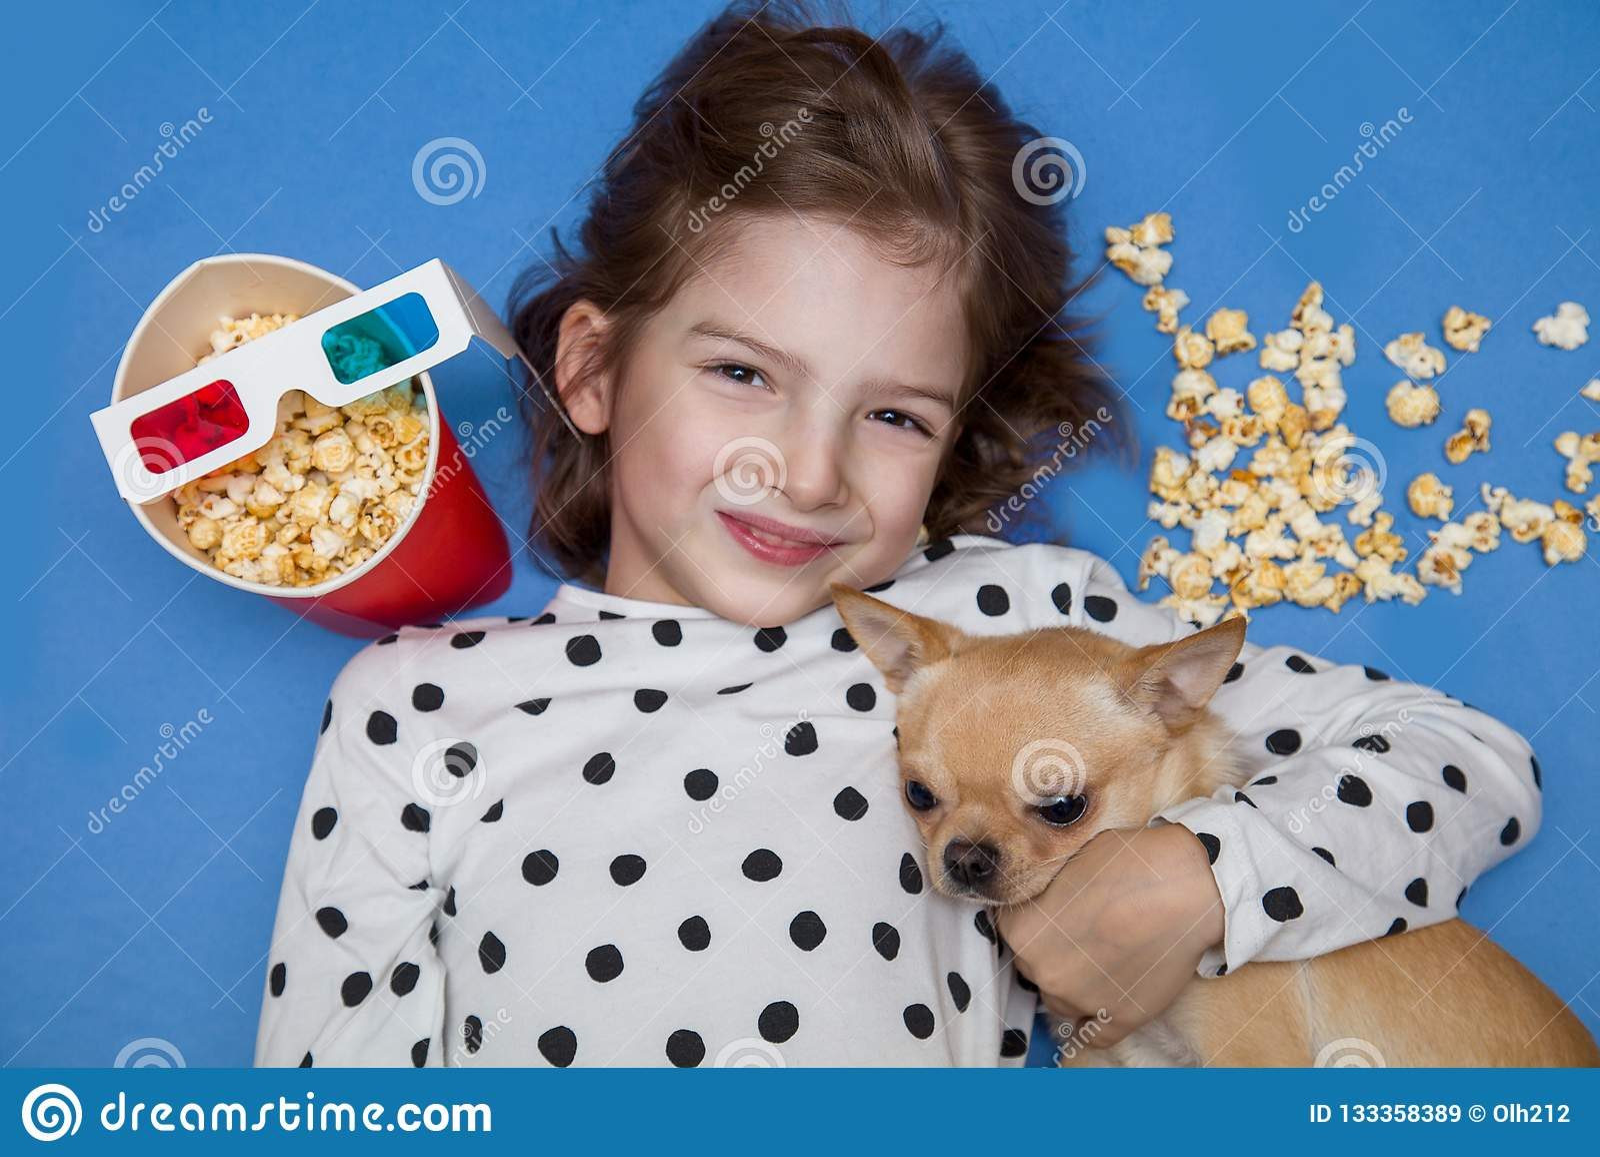 Meisje en weinig hond het letten op film in 3D glazen met popcorn